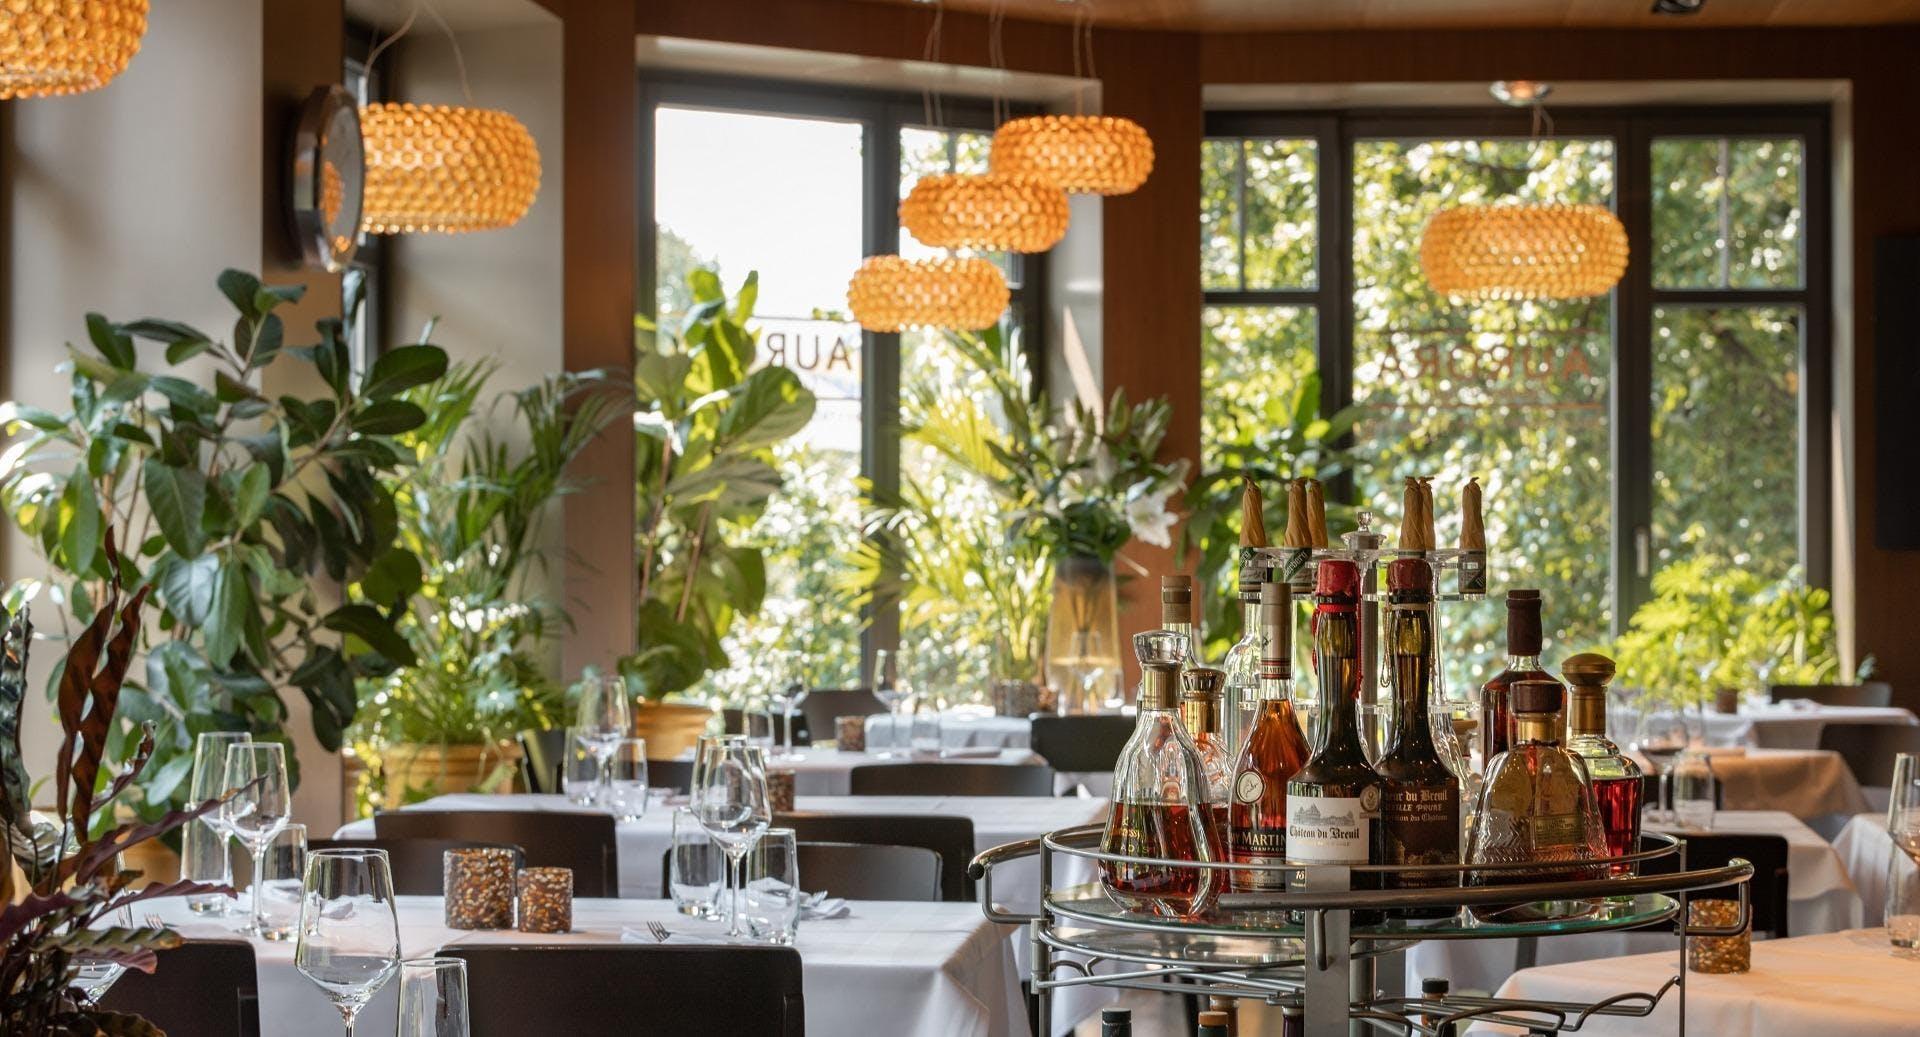 Aurora – amaze me. BAHNHOFSTRASSE I Restaurant & Bar Zurigo image 2